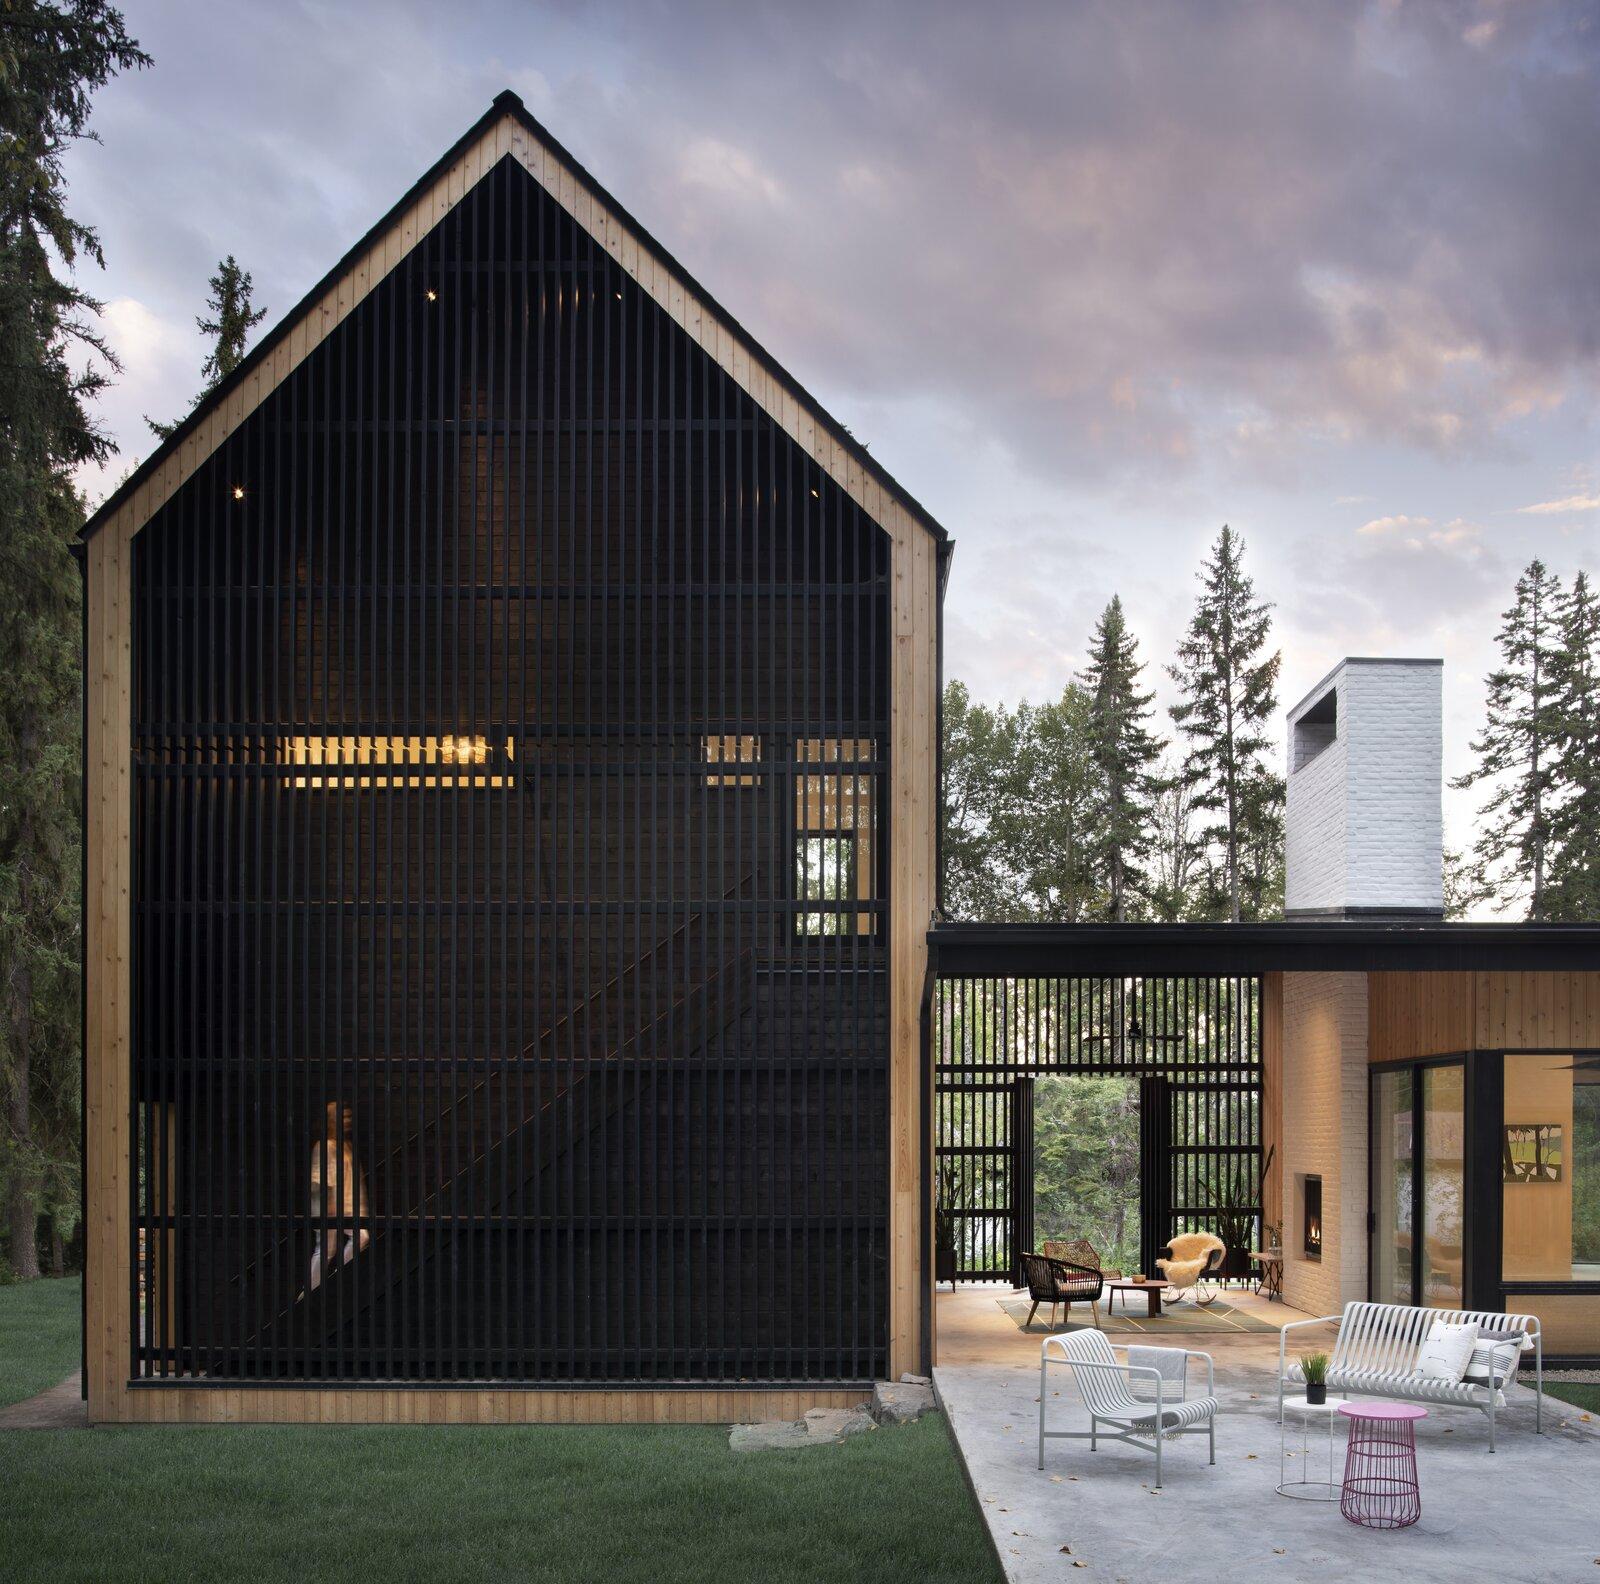 Backyard of Twin Peaks by Workaday Design